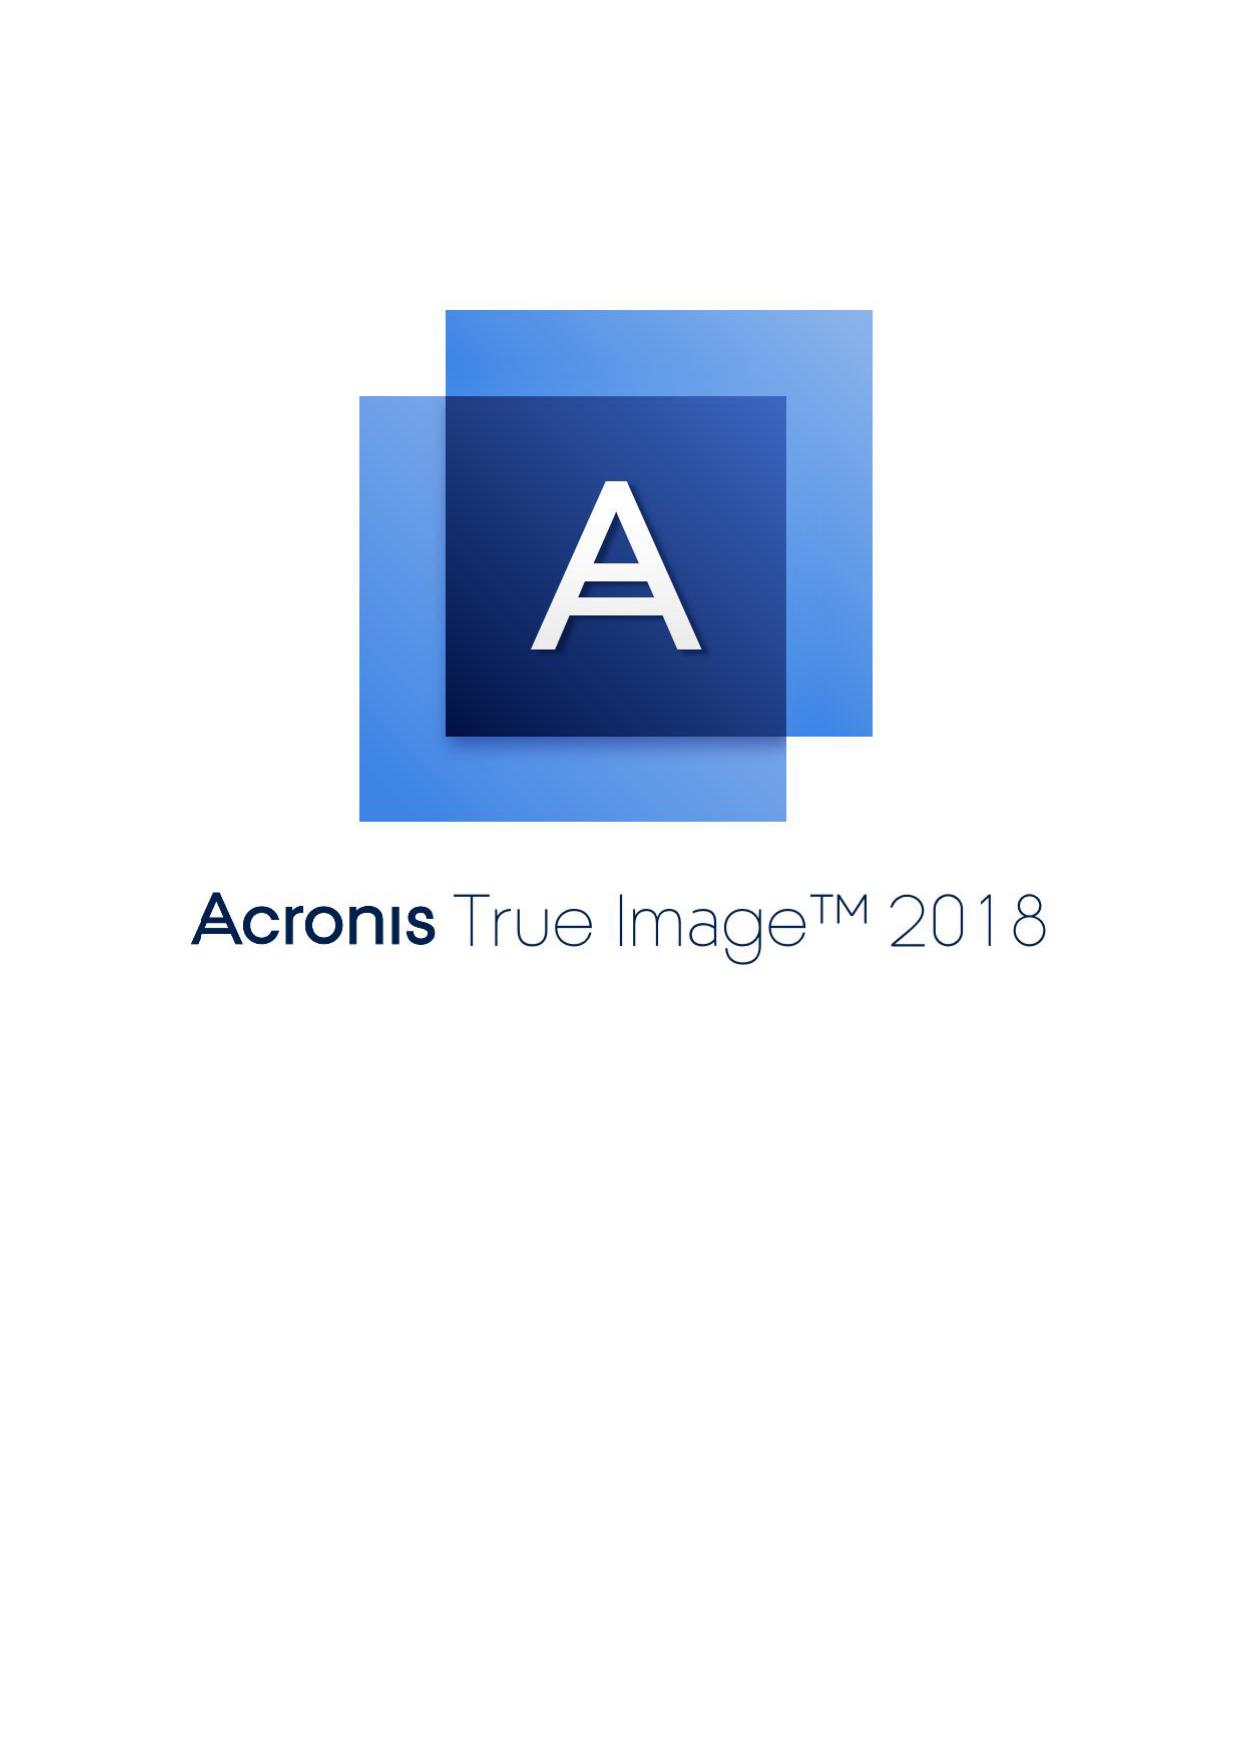 acronis media builder 2018 download